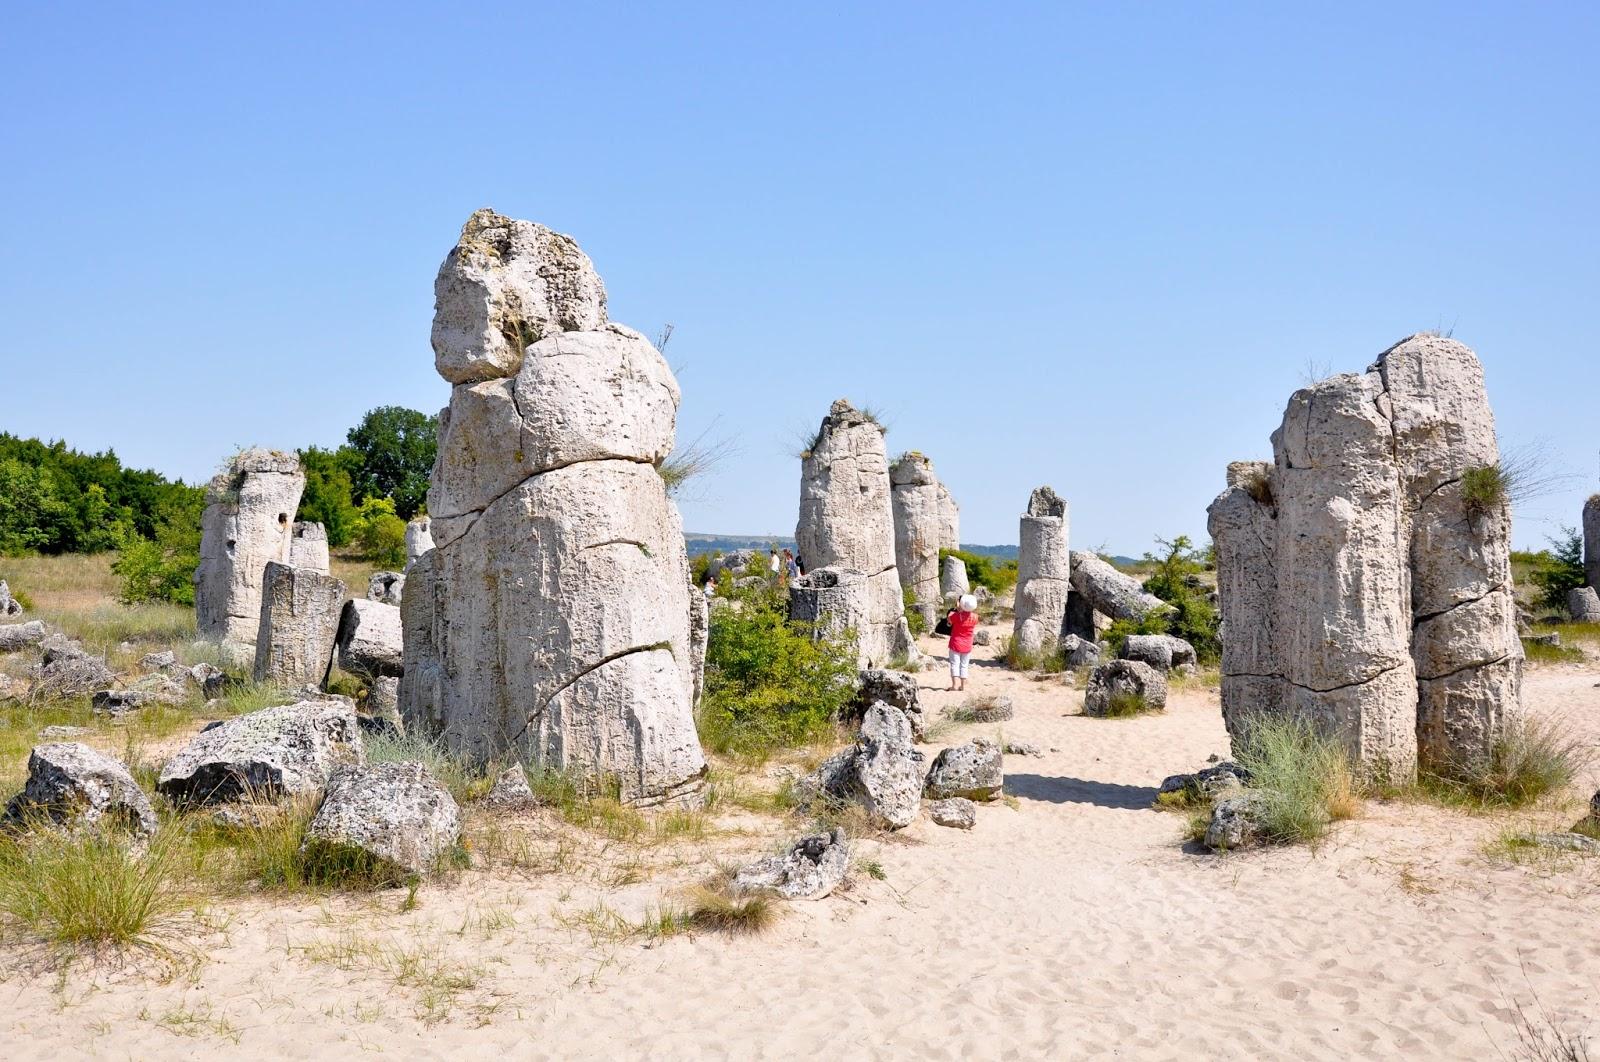 Among the stone pillars, The Stone Forest, Varna, Bulgaria